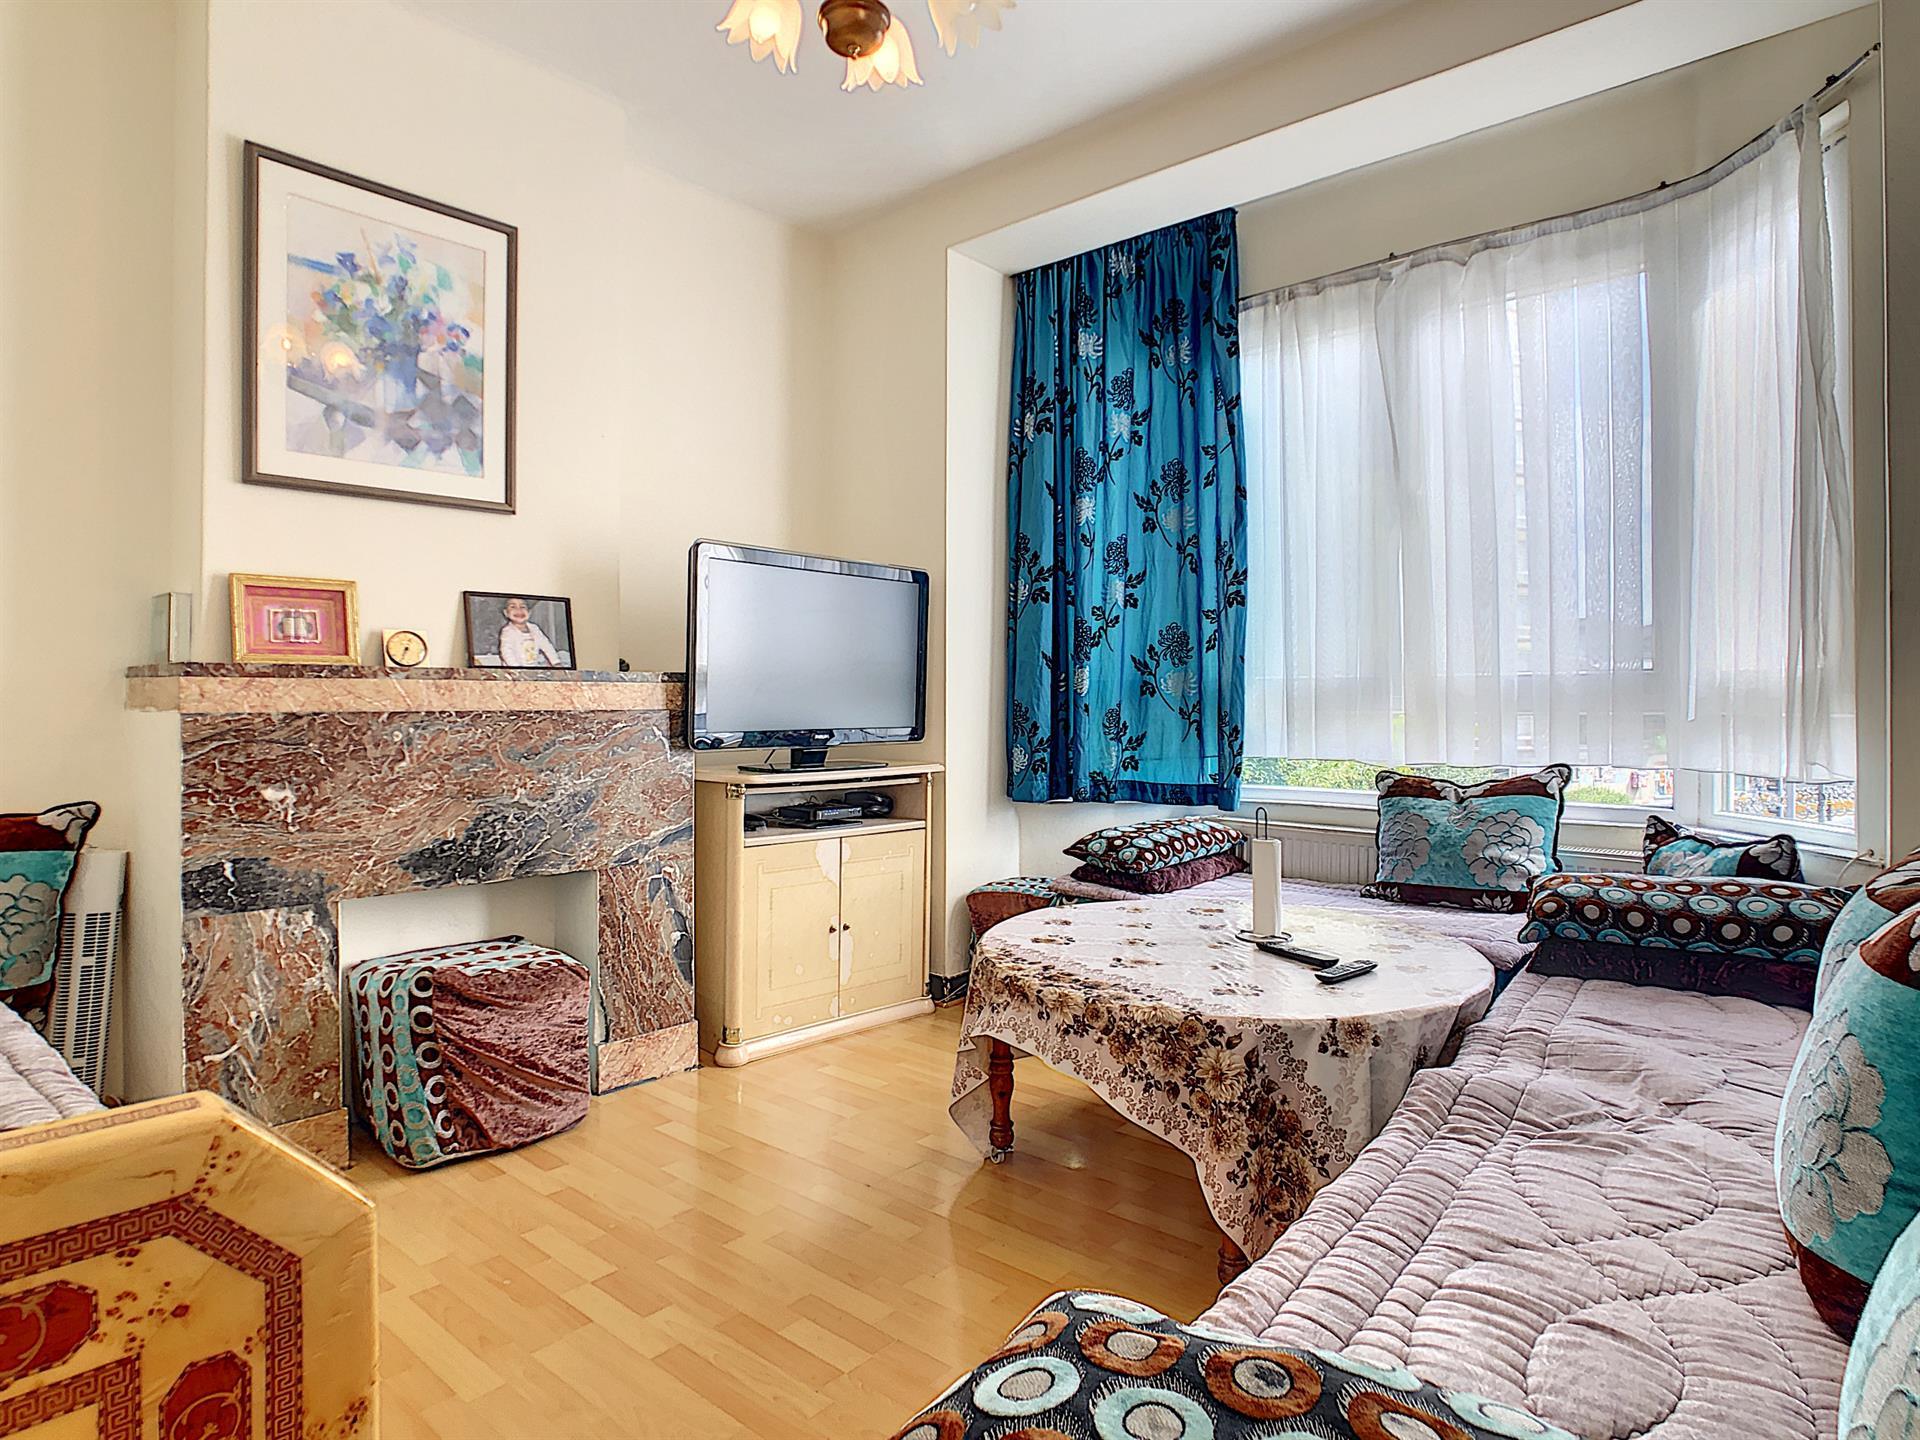 Appartement - Molenbeek-Saint-Jean - #4443903-0